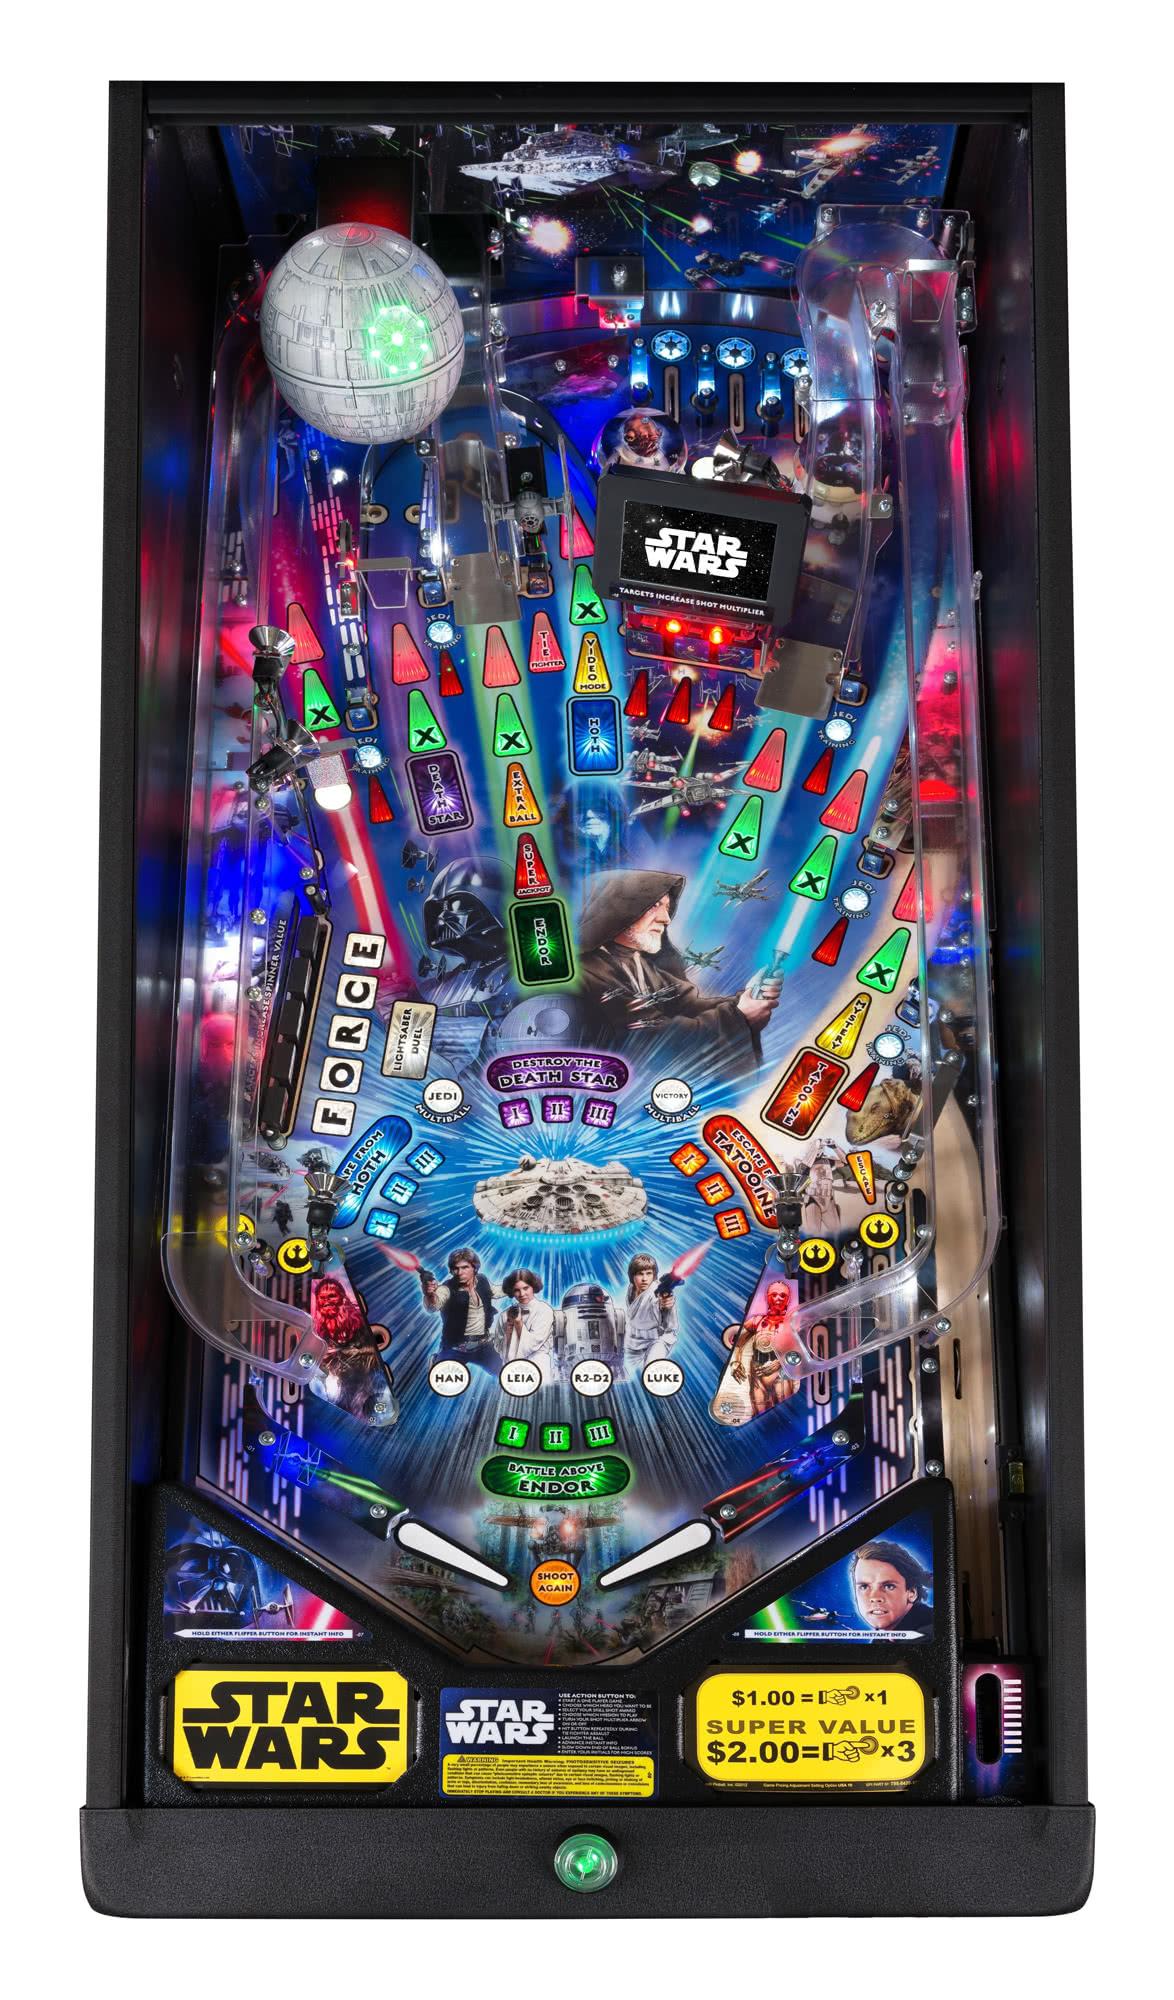 Star Wars Pinball Machine >> Stern Star Wars Pro Pinball Machine | Liberty Games